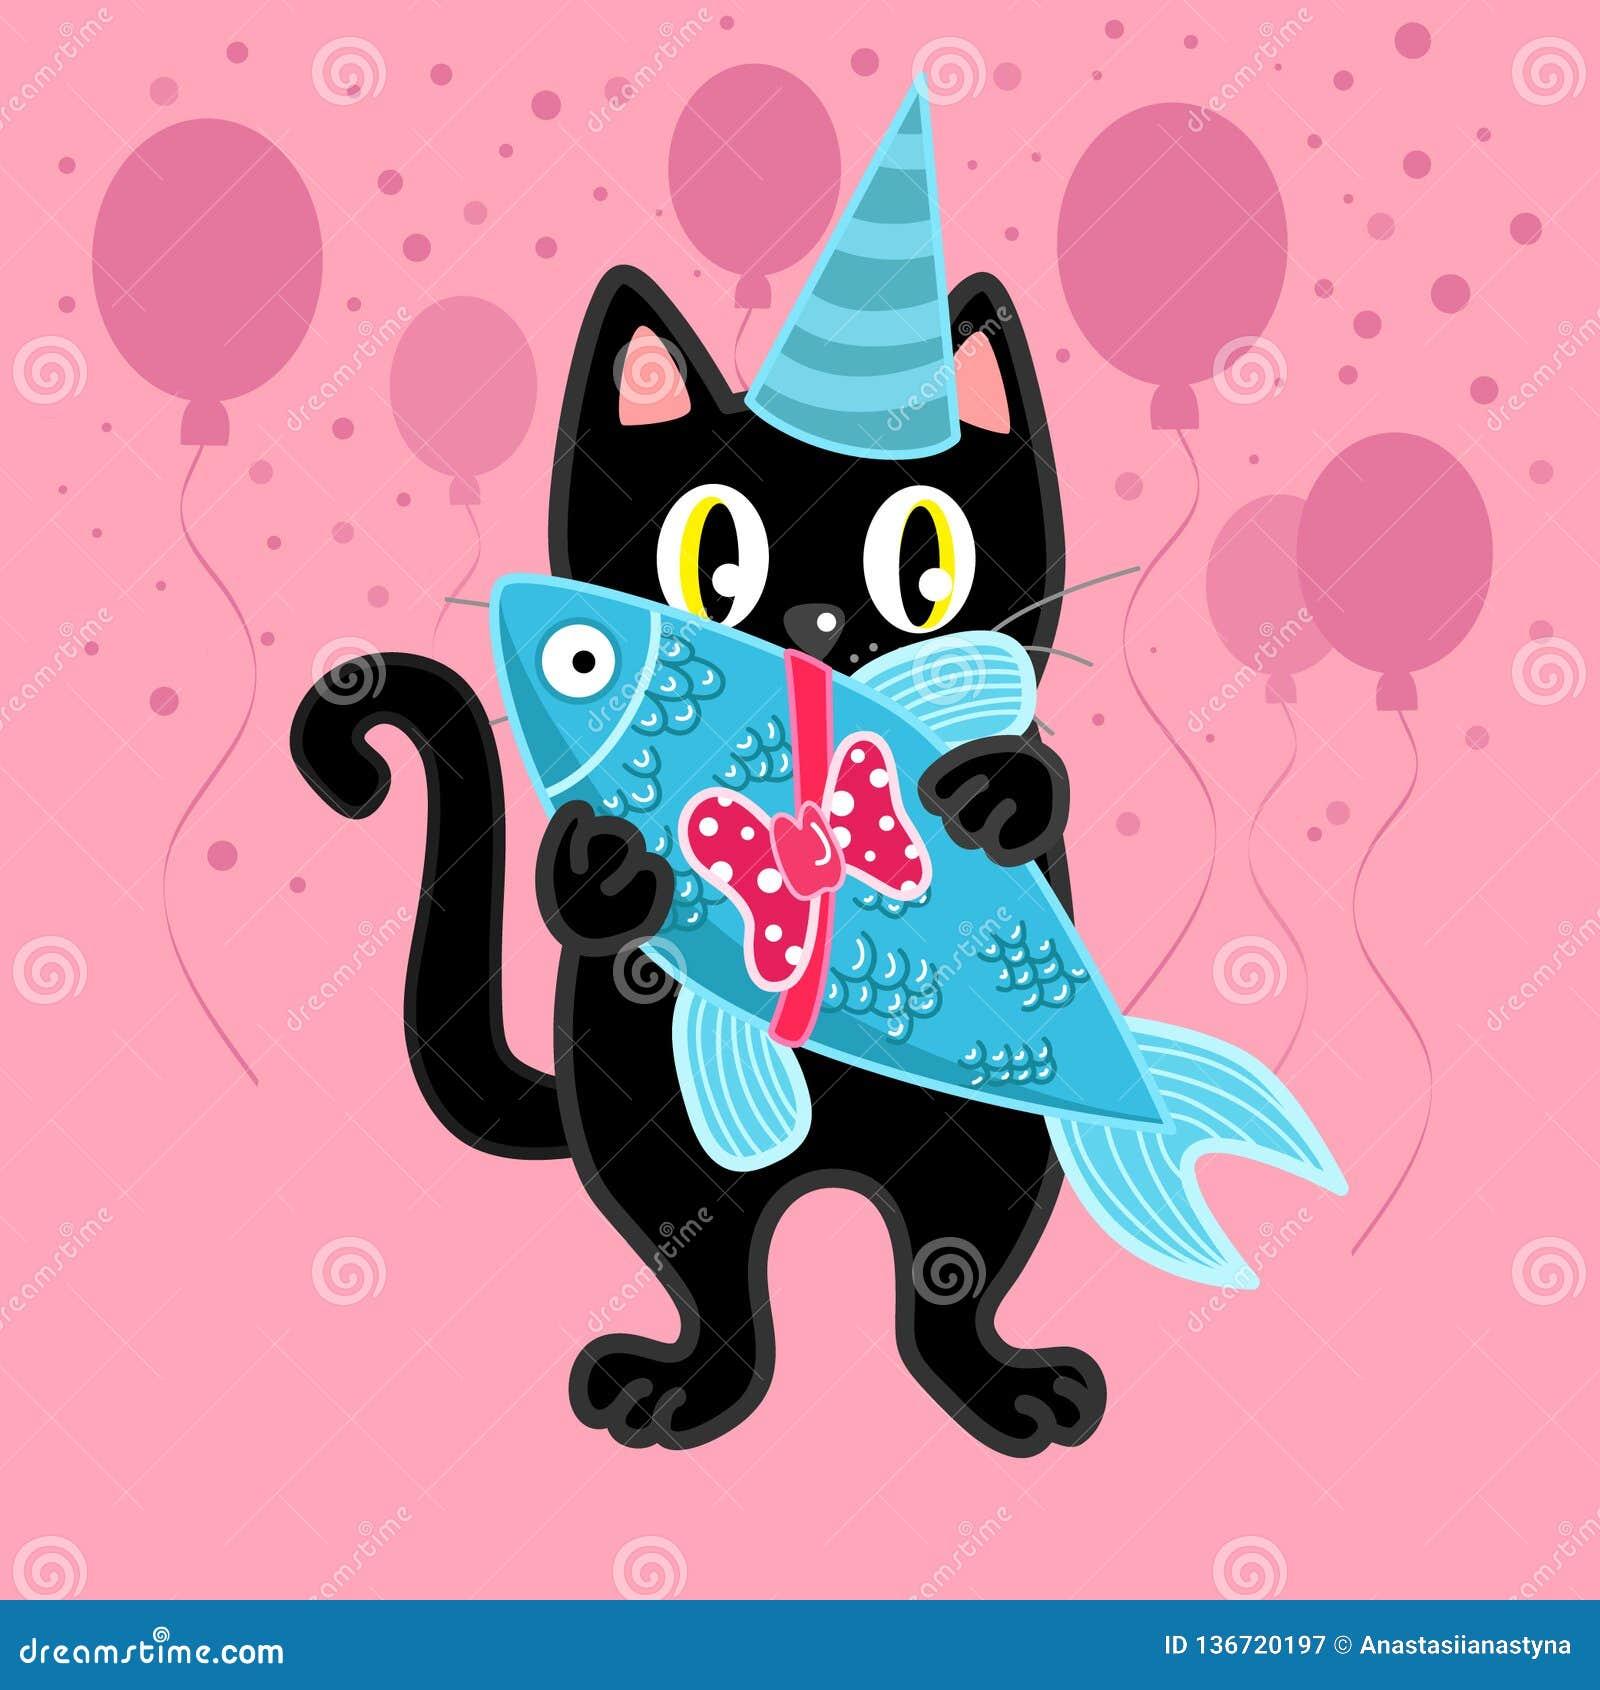 Image result for birthday black cat pink